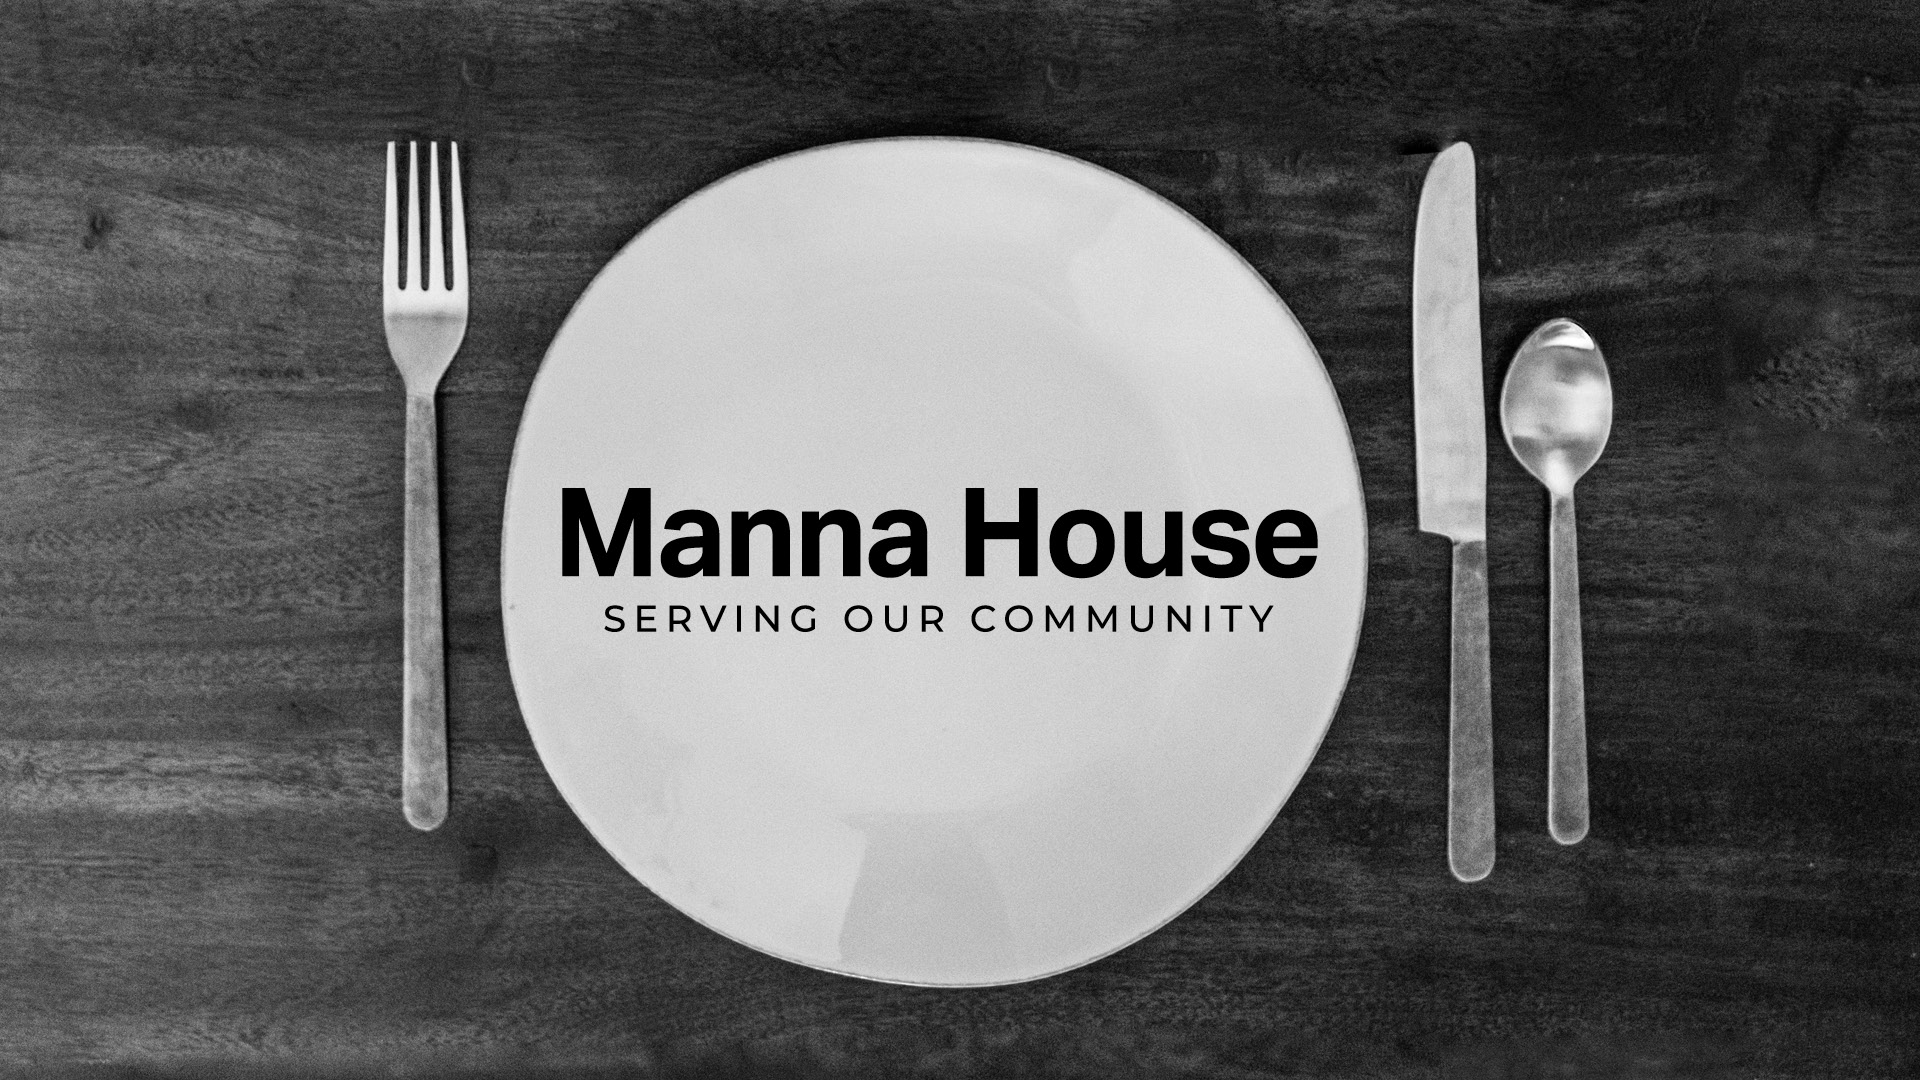 MannaHouse2018-1920x1080.jpg